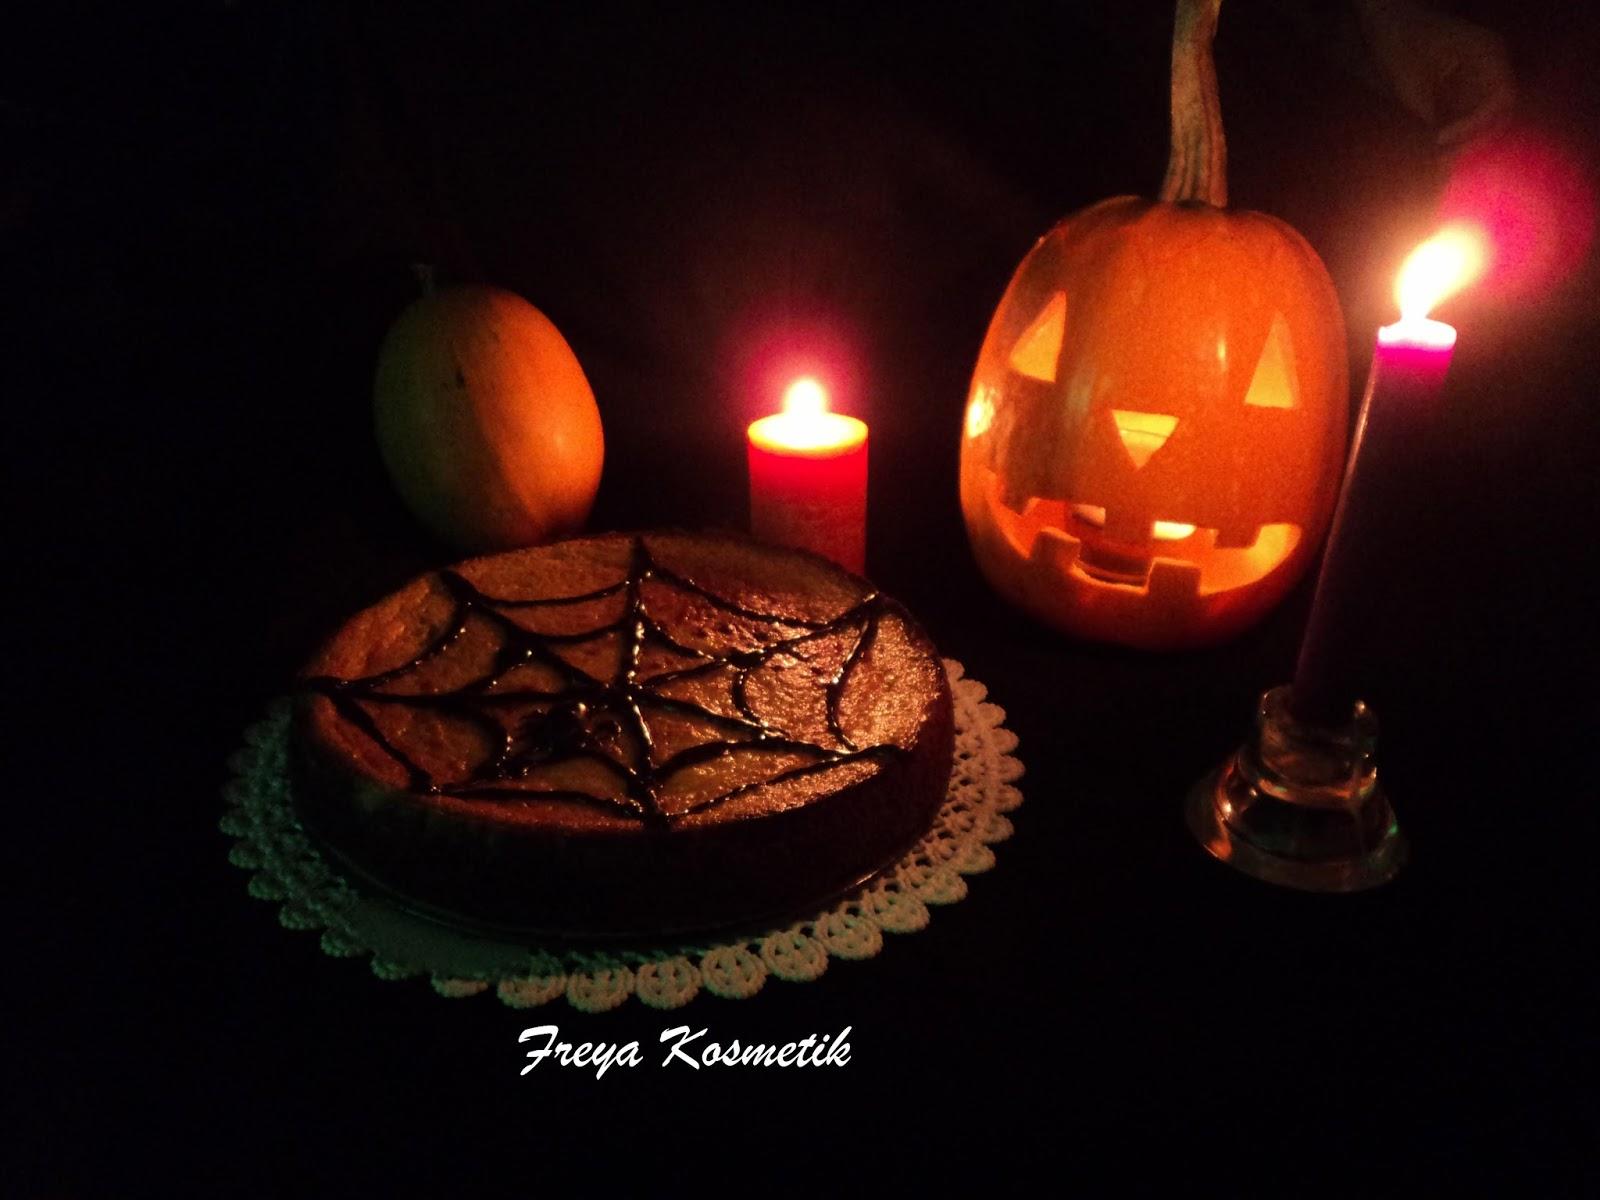 Intagliare Zucca Per Halloween Disegni freya kosmetik: come intagliare la zucca per halloween